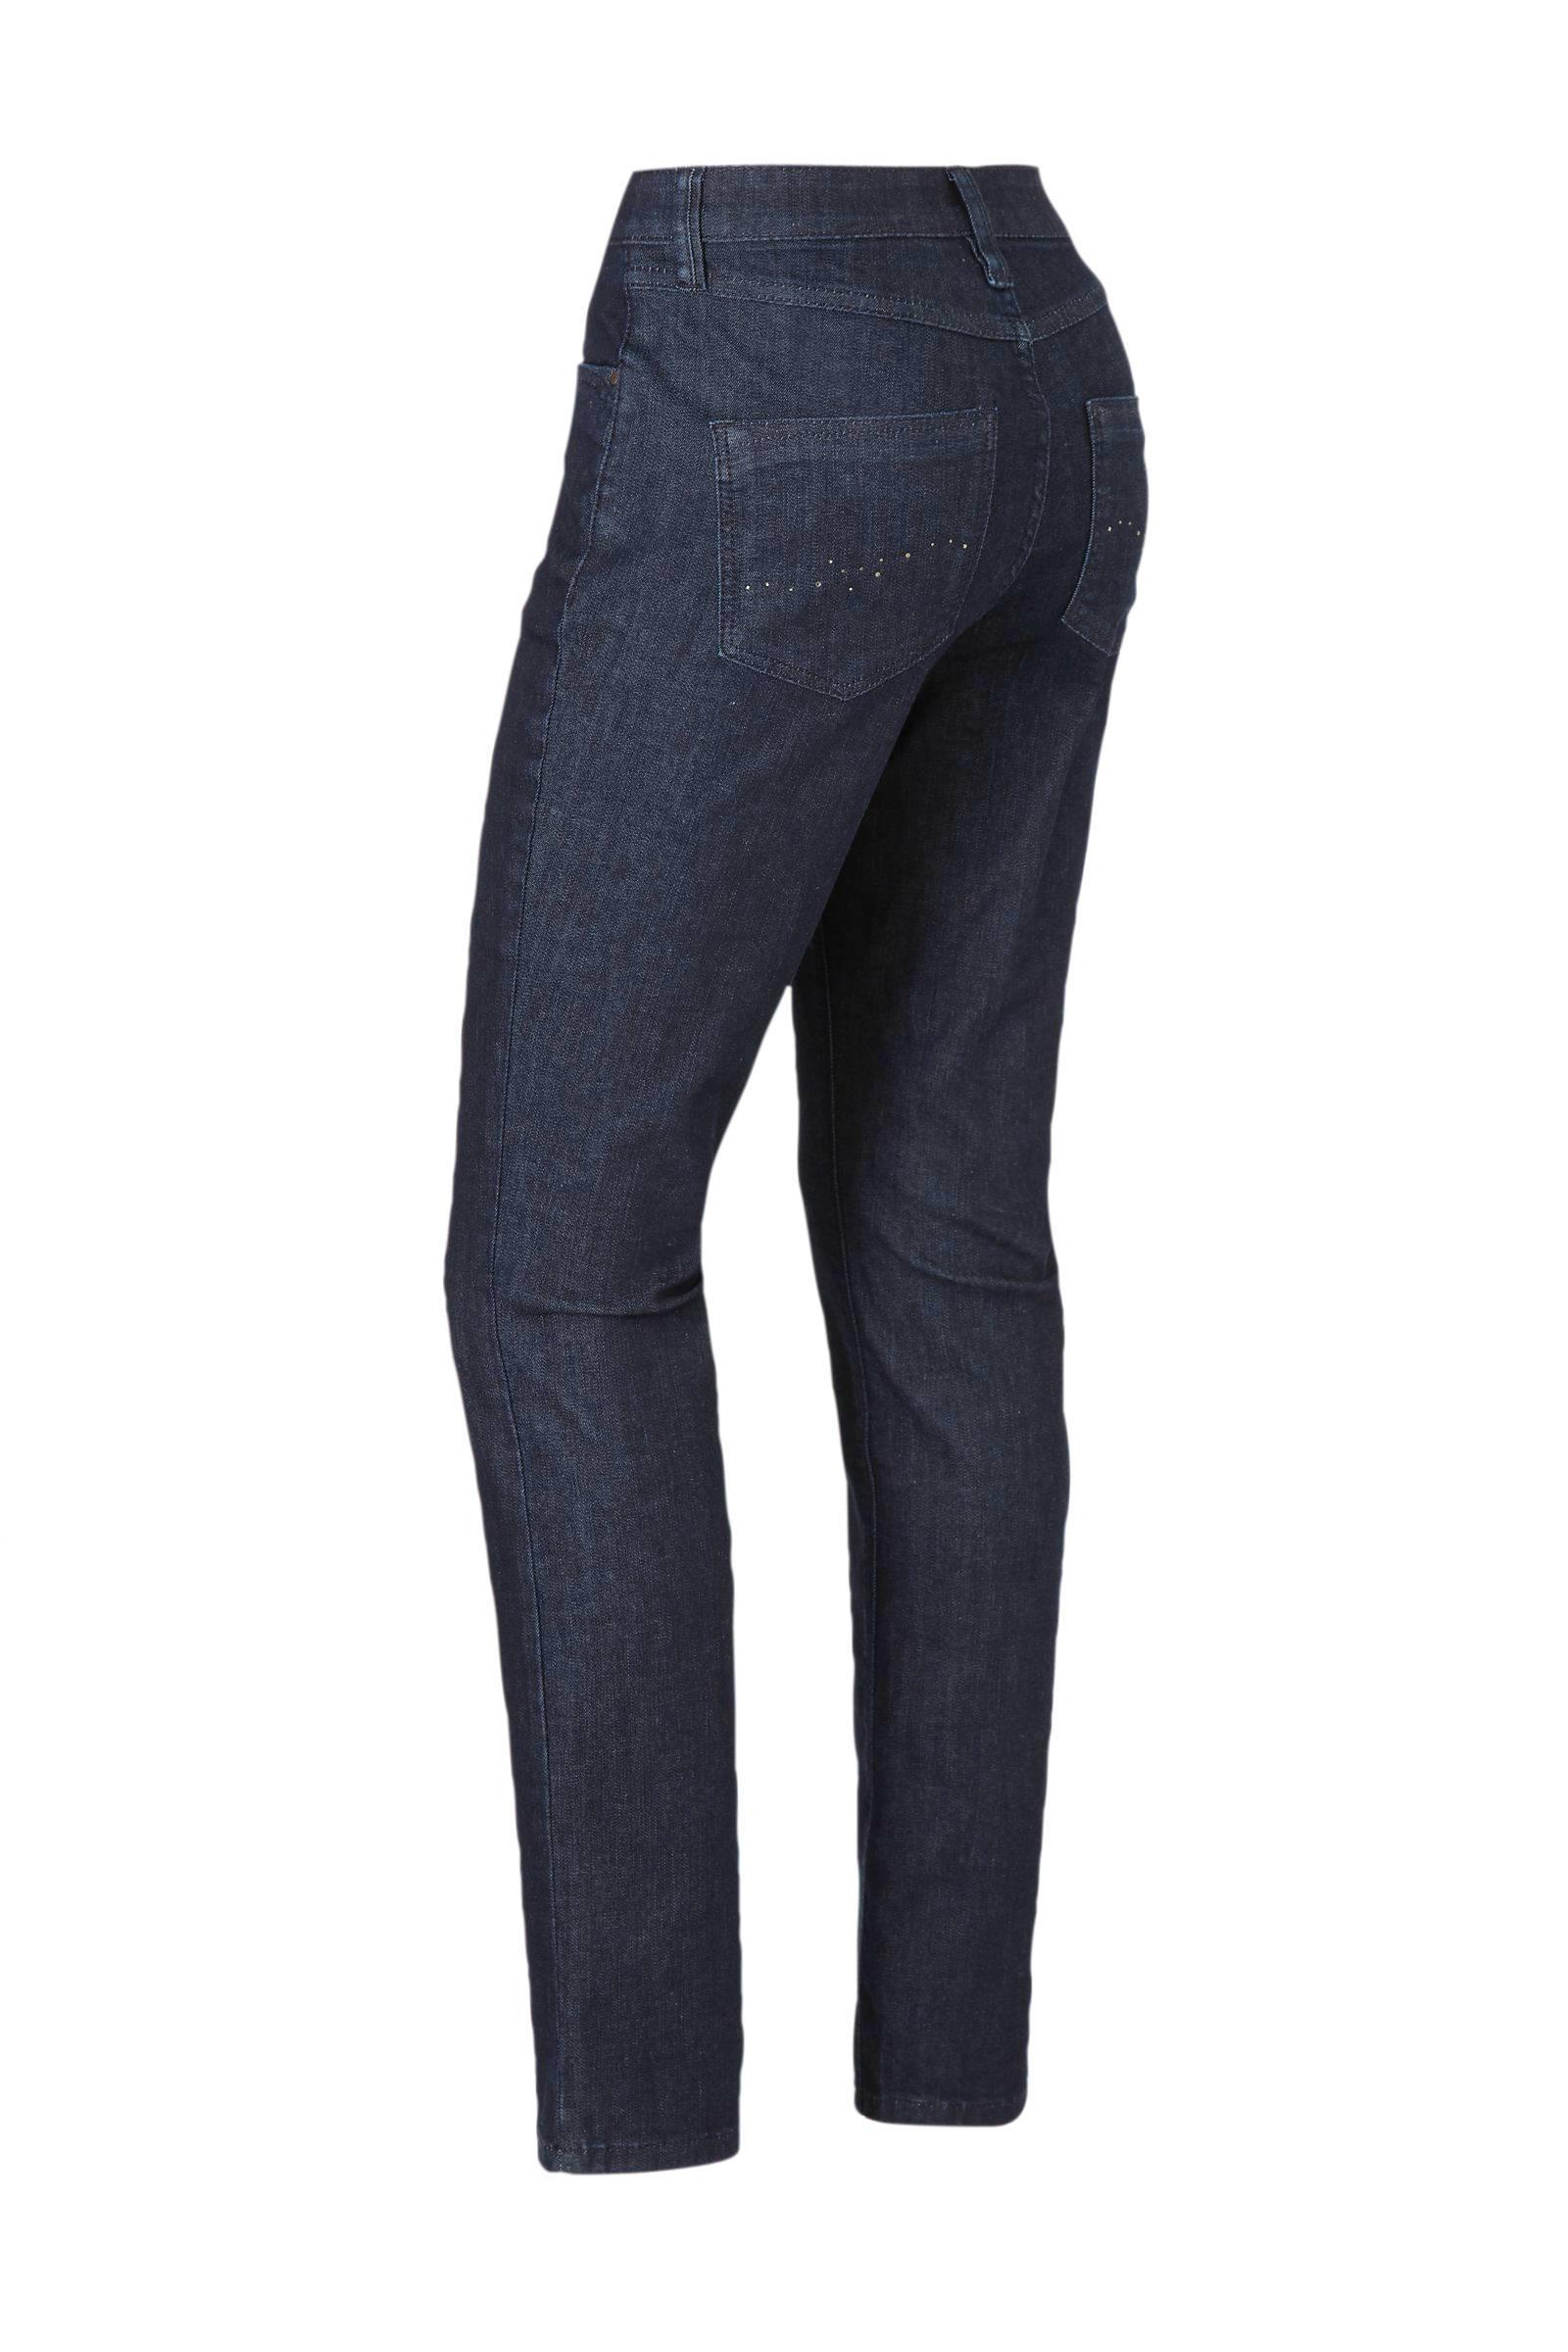 C&A The Denim high waist slim fit jeans blauw